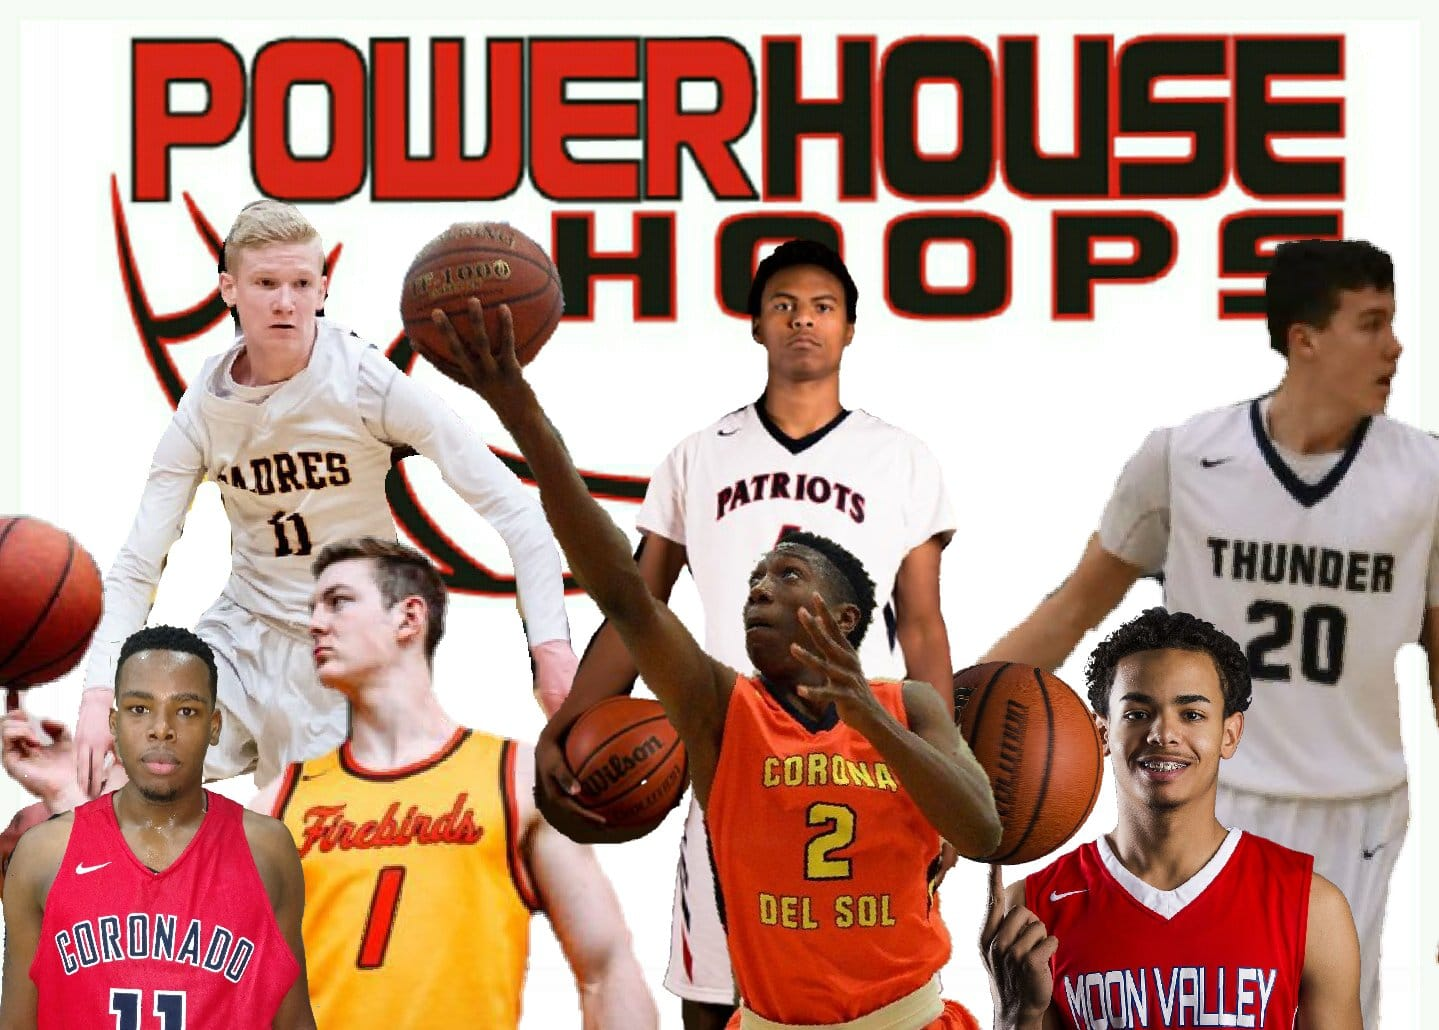 Powerhouse Hoops